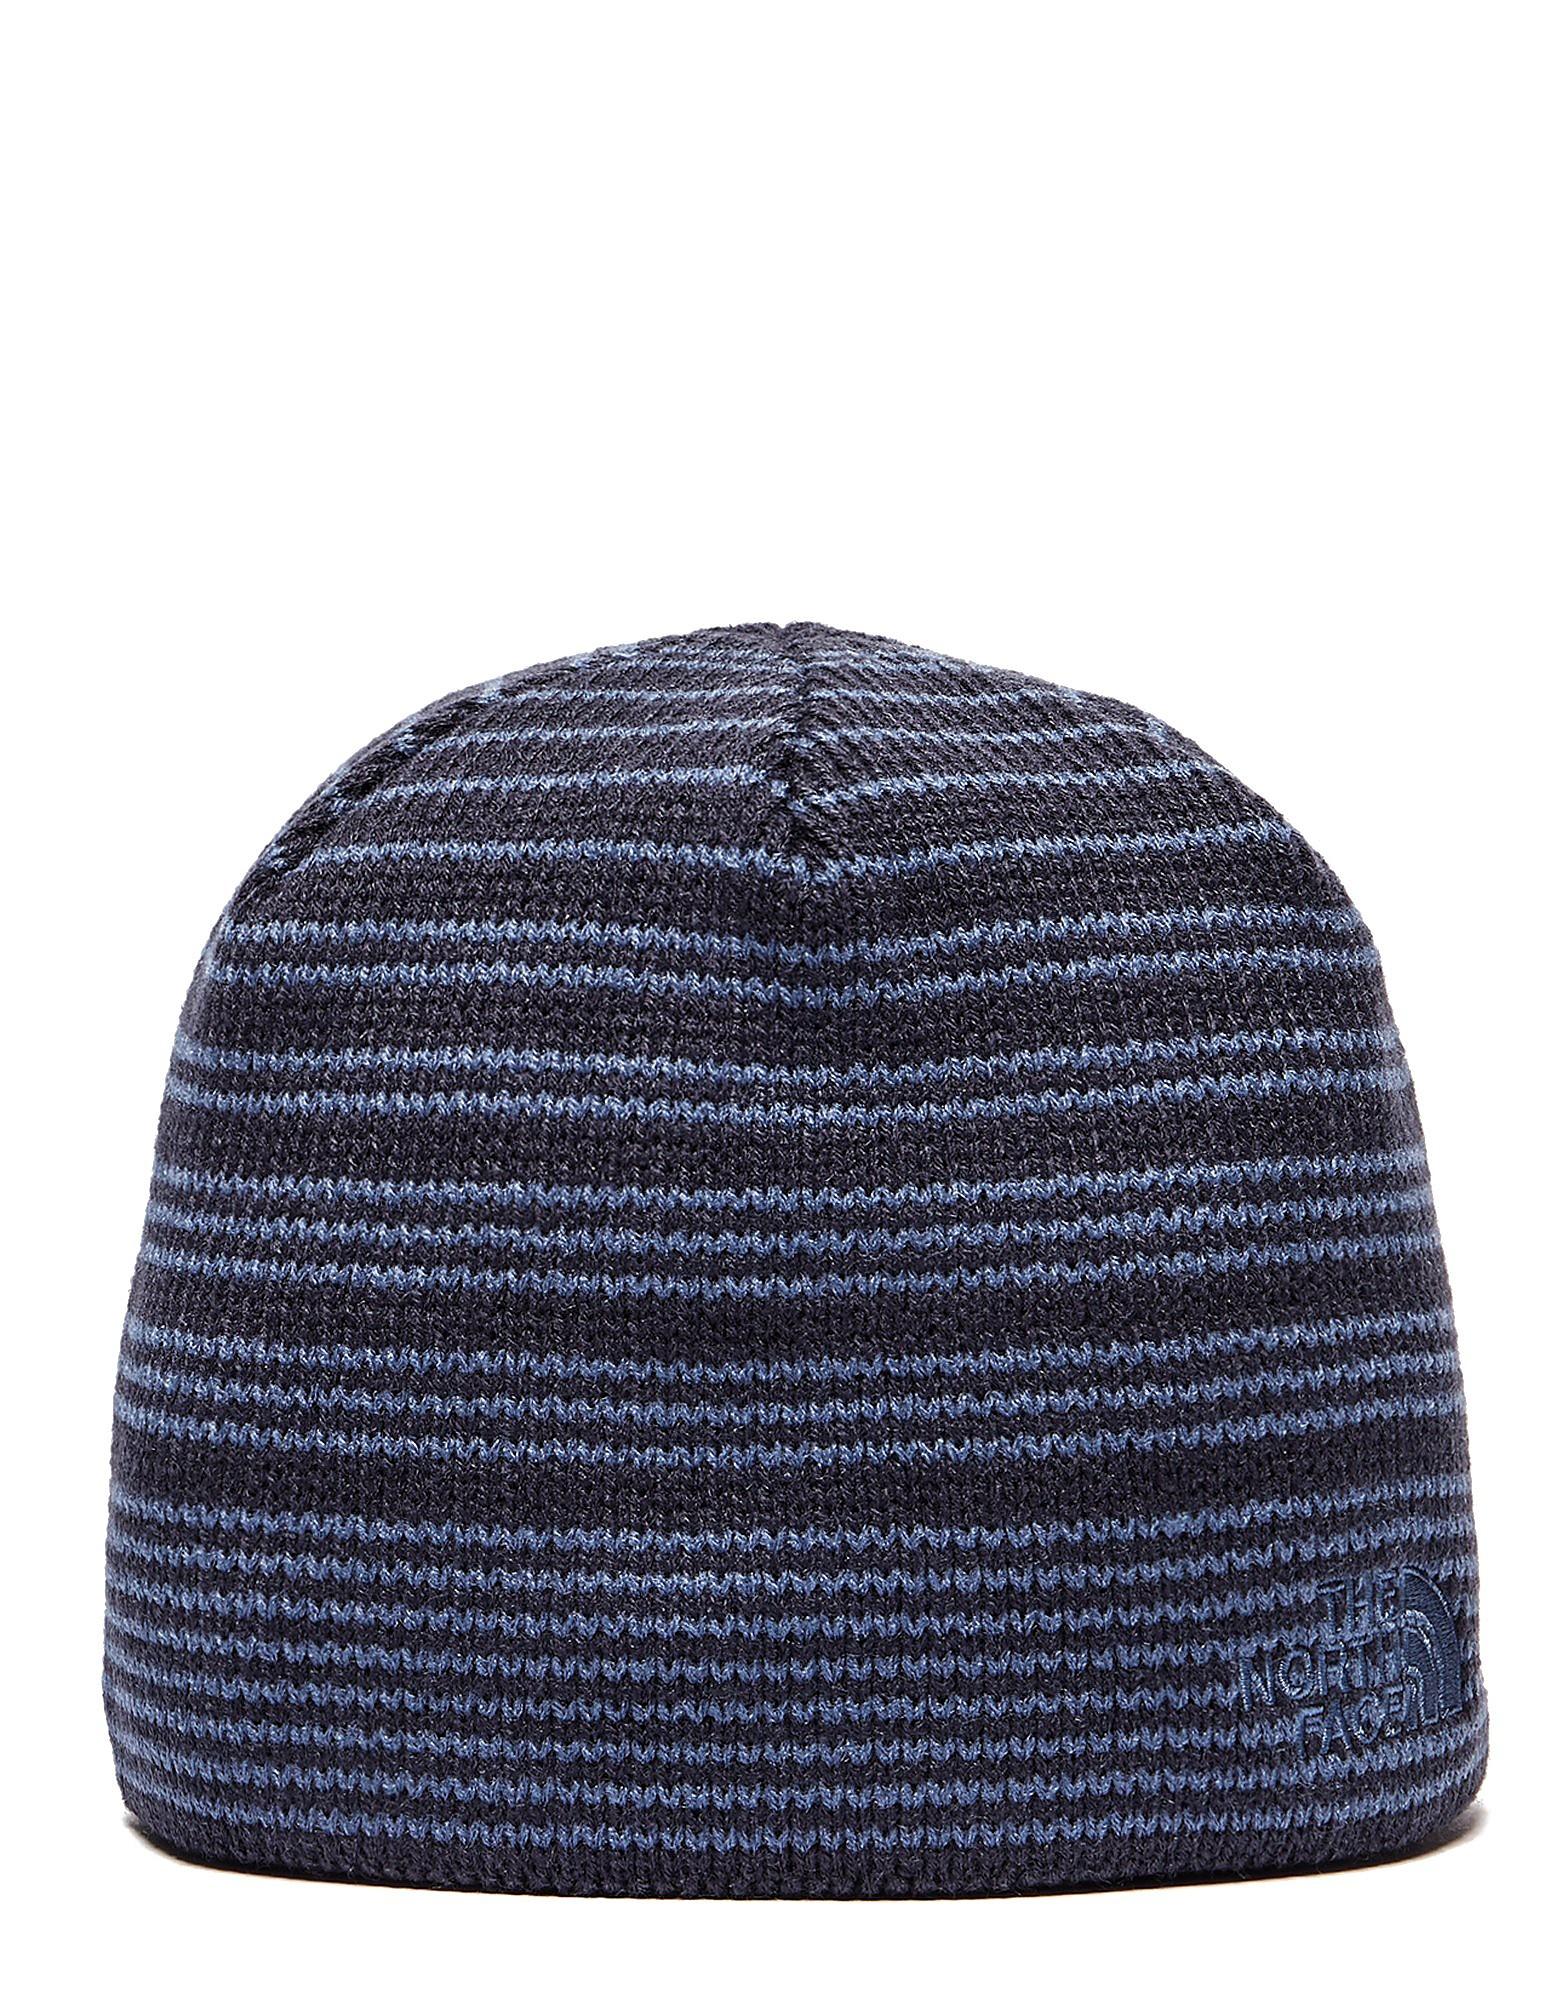 The North Face Bones Beanie Hat